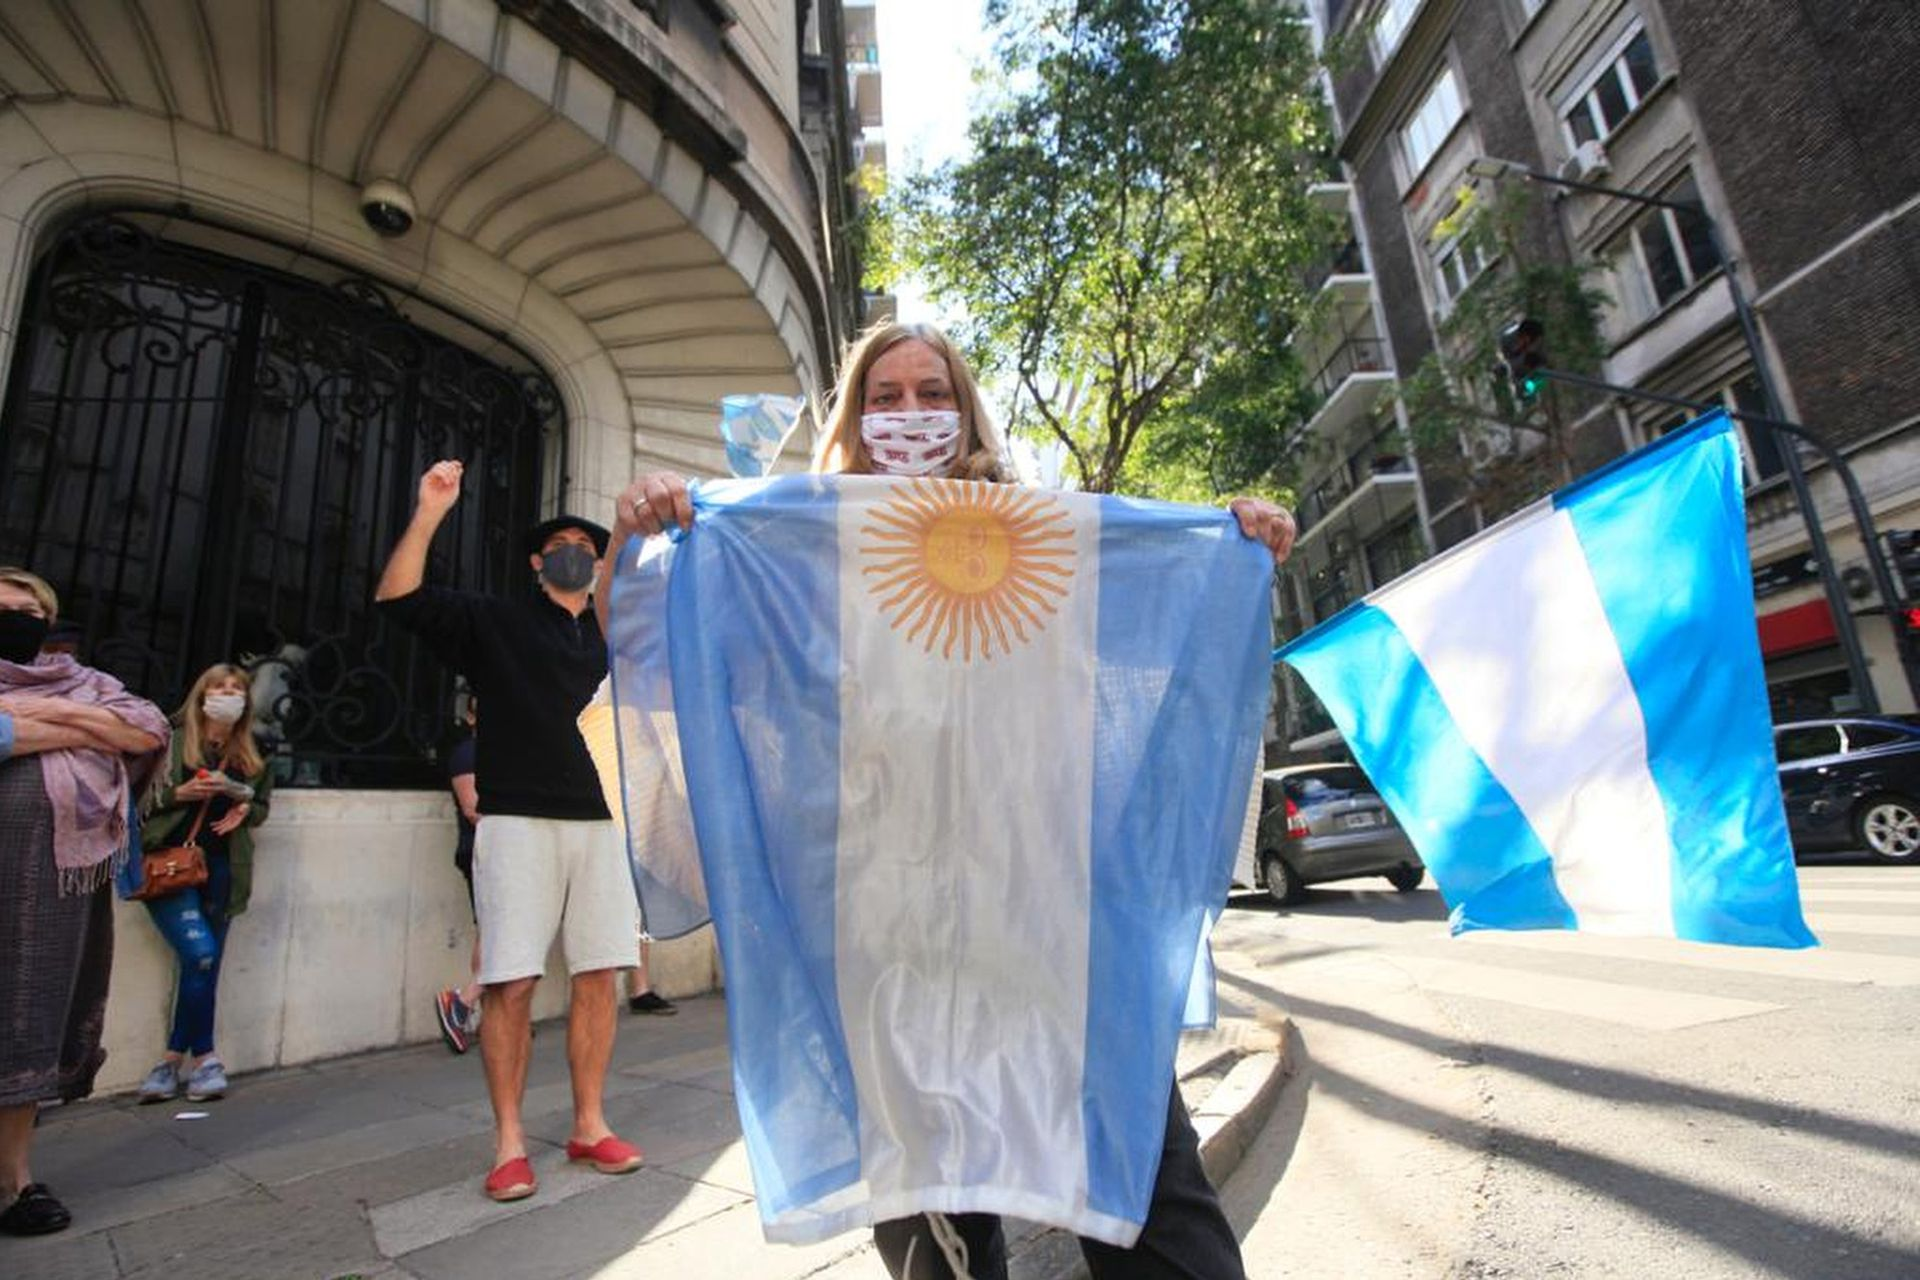 Algunos manifestantes fueron al edificio donde vive Cristina Kirchner, en Barrio Norte